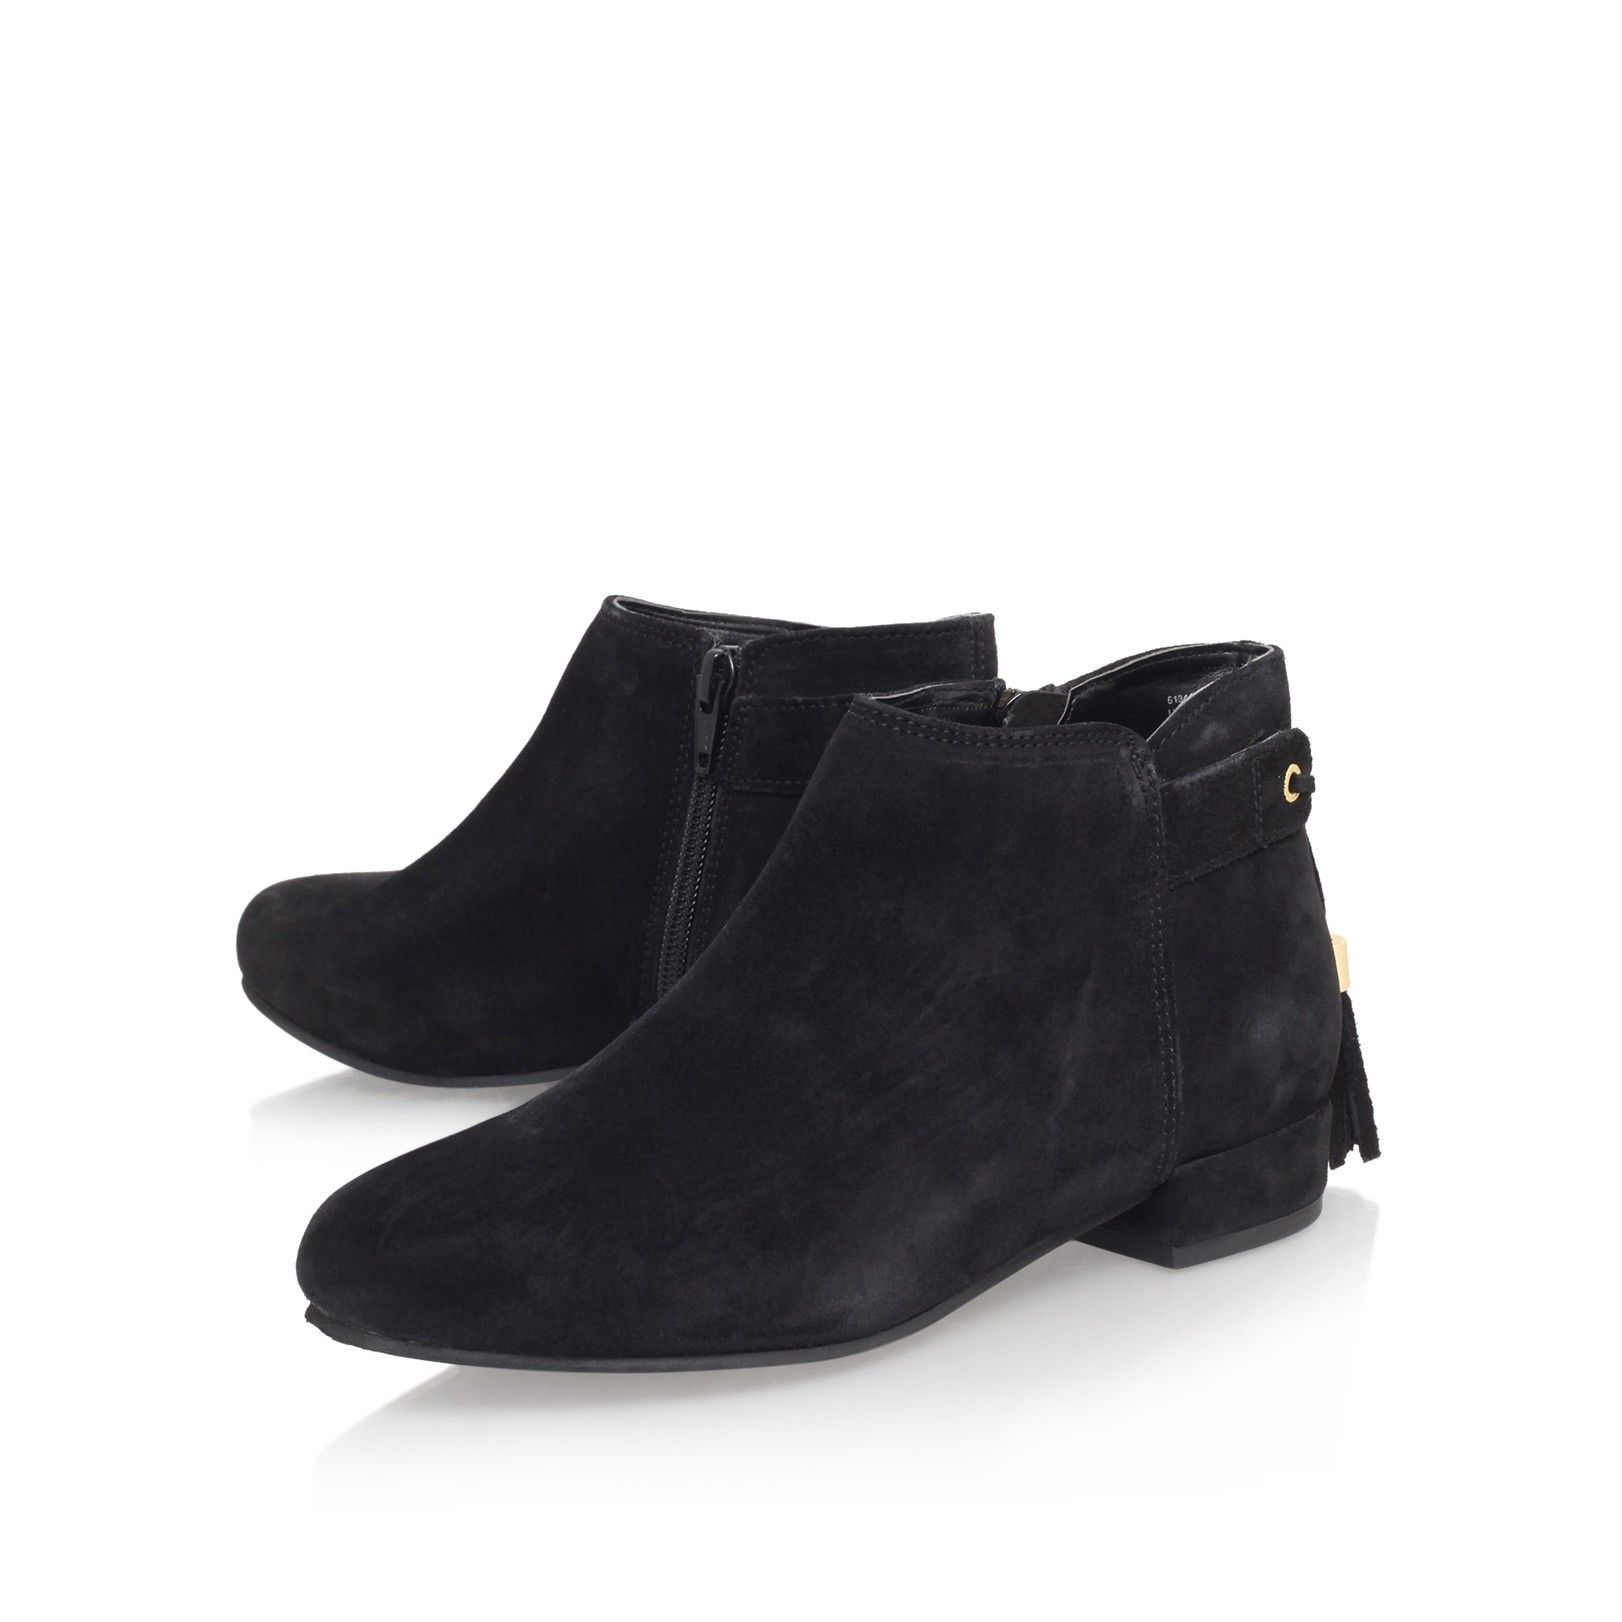 tassel black flat ankle boots from Carvela Kurt Geiger | Boots ...